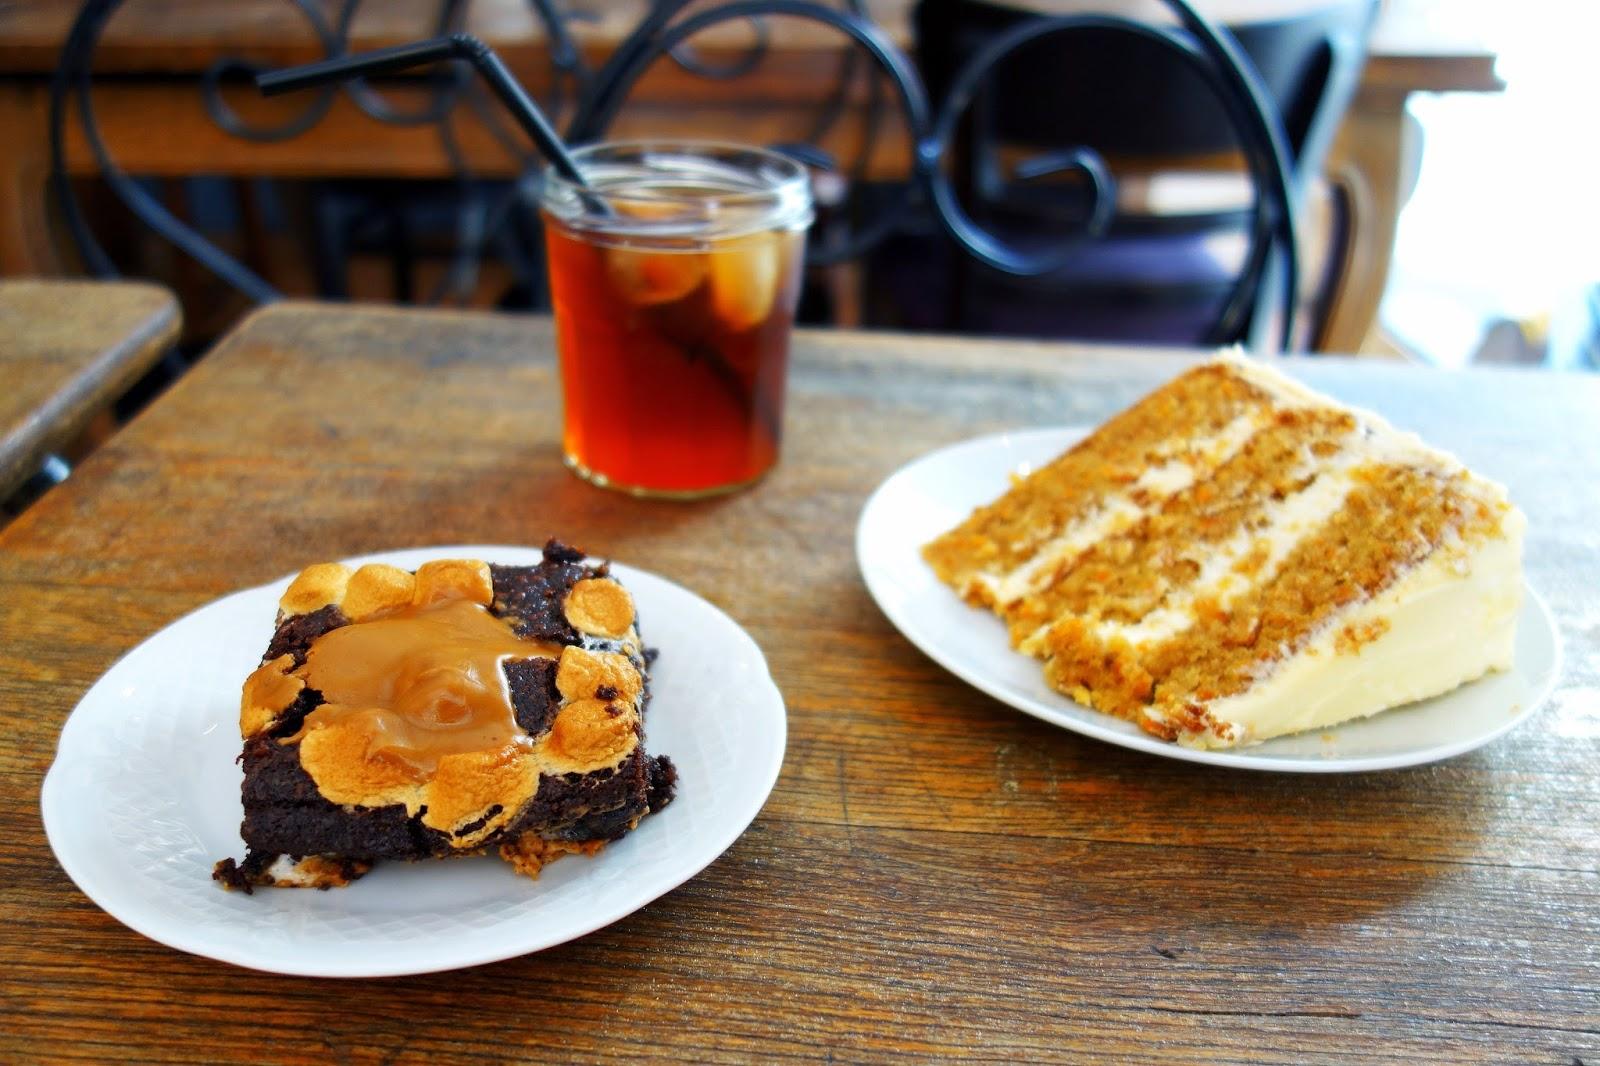 sugarplum cake shop paris 5 rue du cardinal lemoine 14 bis.JPG